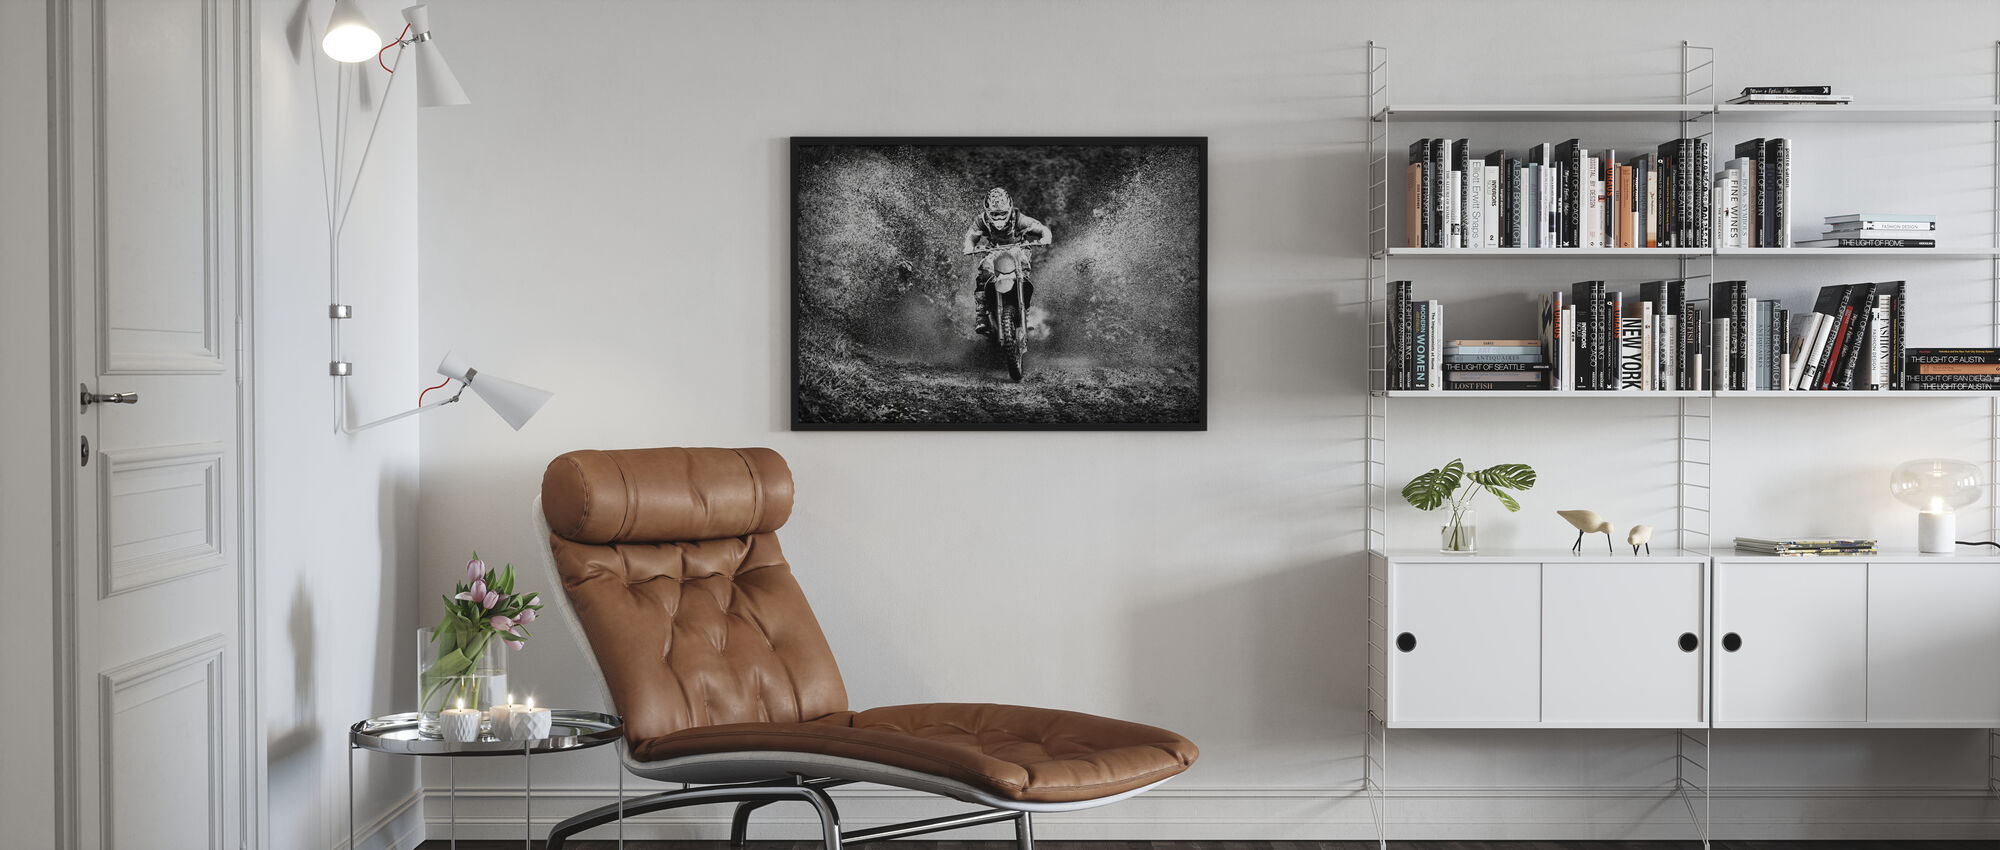 Drops - Poster - Living Room